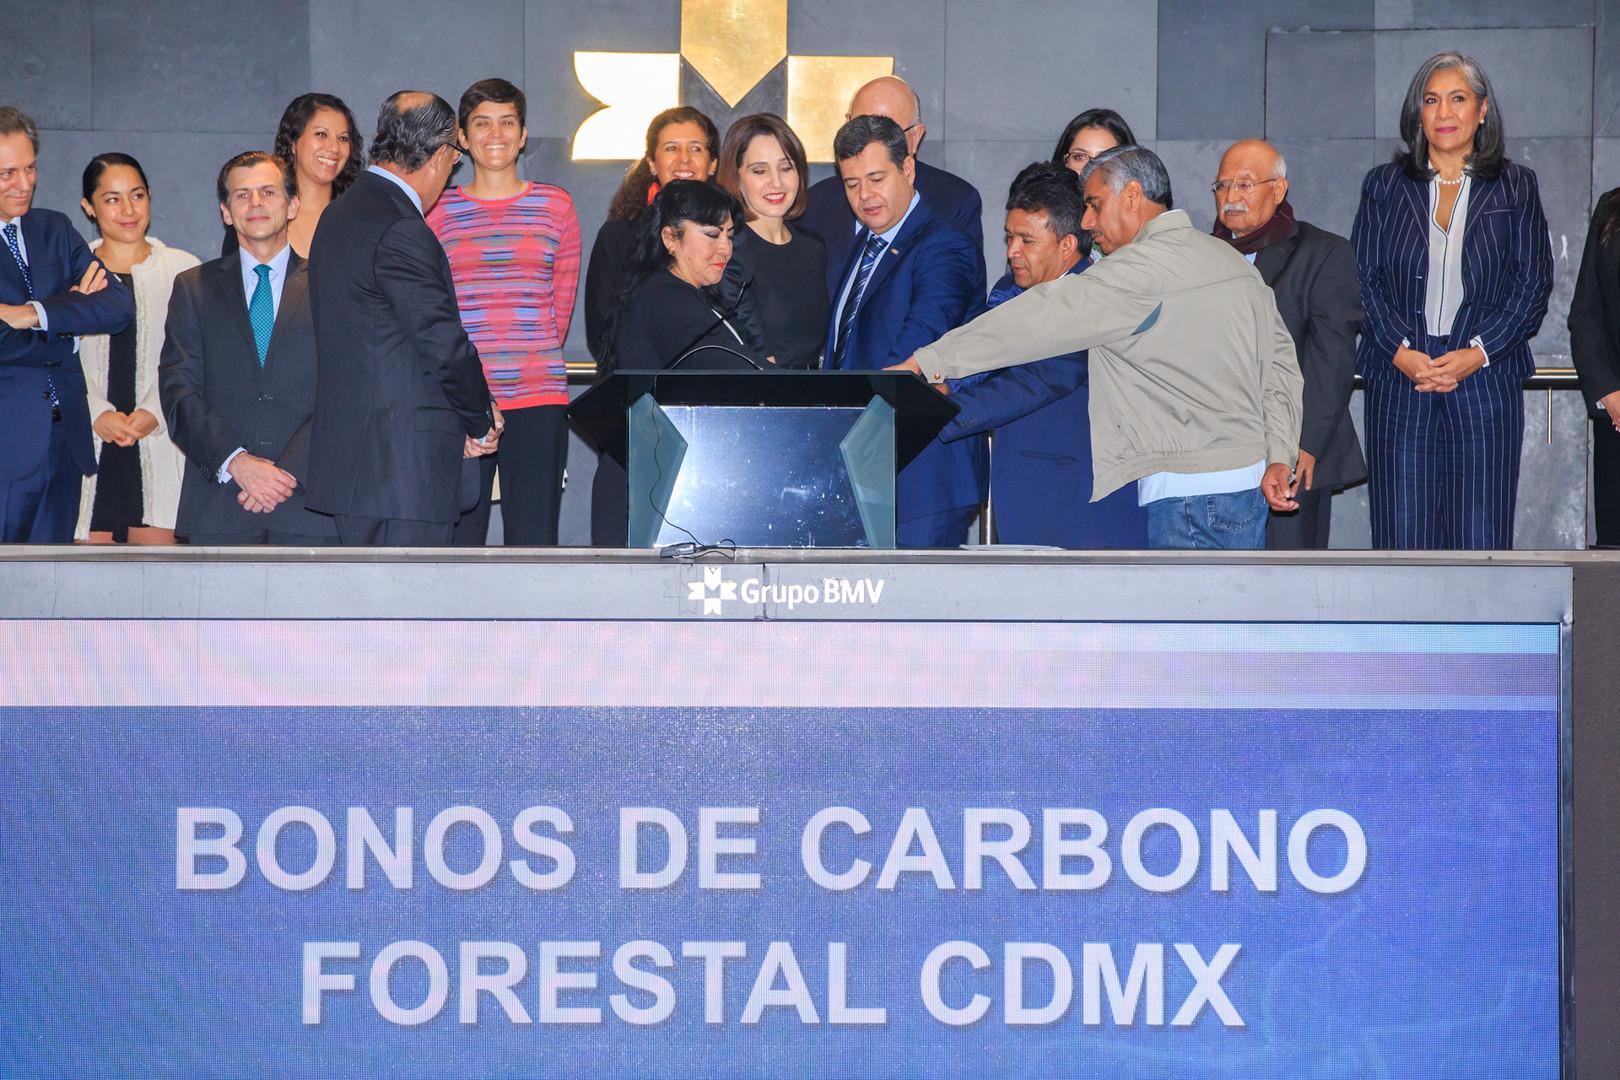 Bonos de carbono forestal